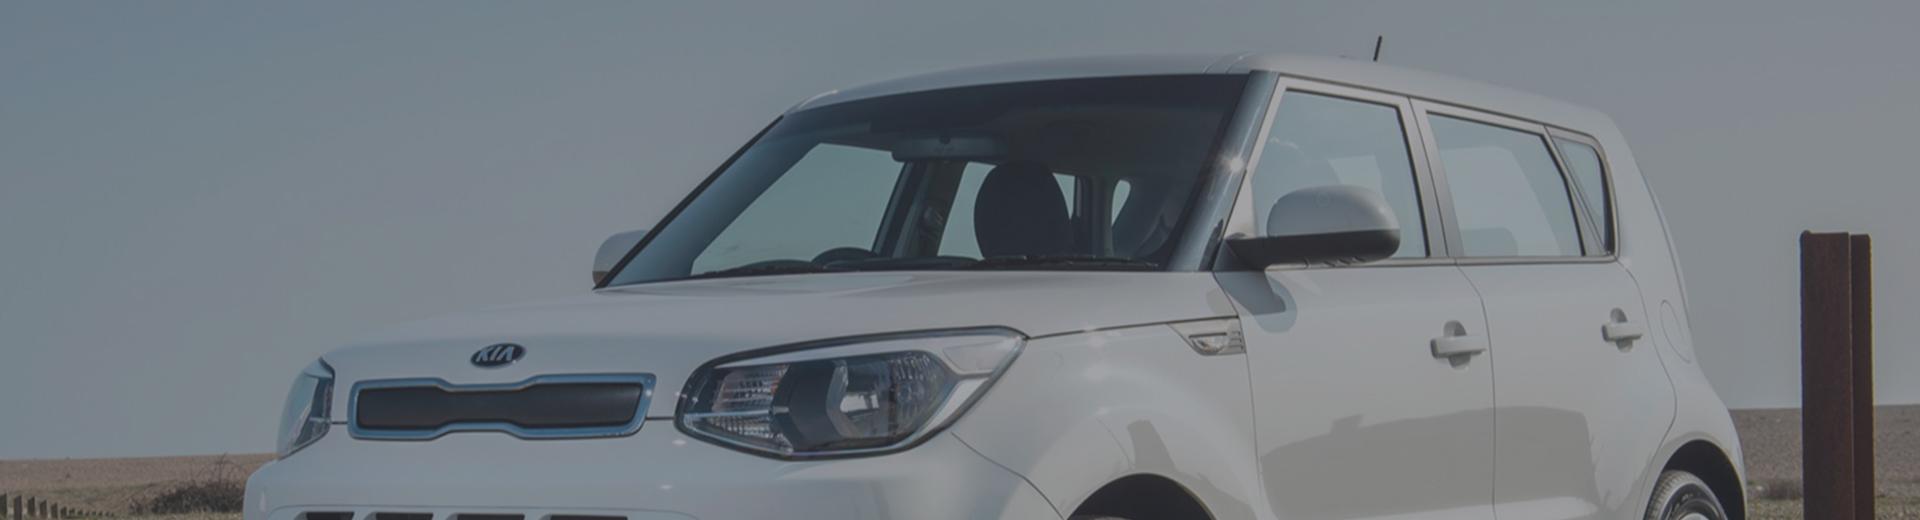 Kia Soul Lease Deals Intelligent Car Leasing